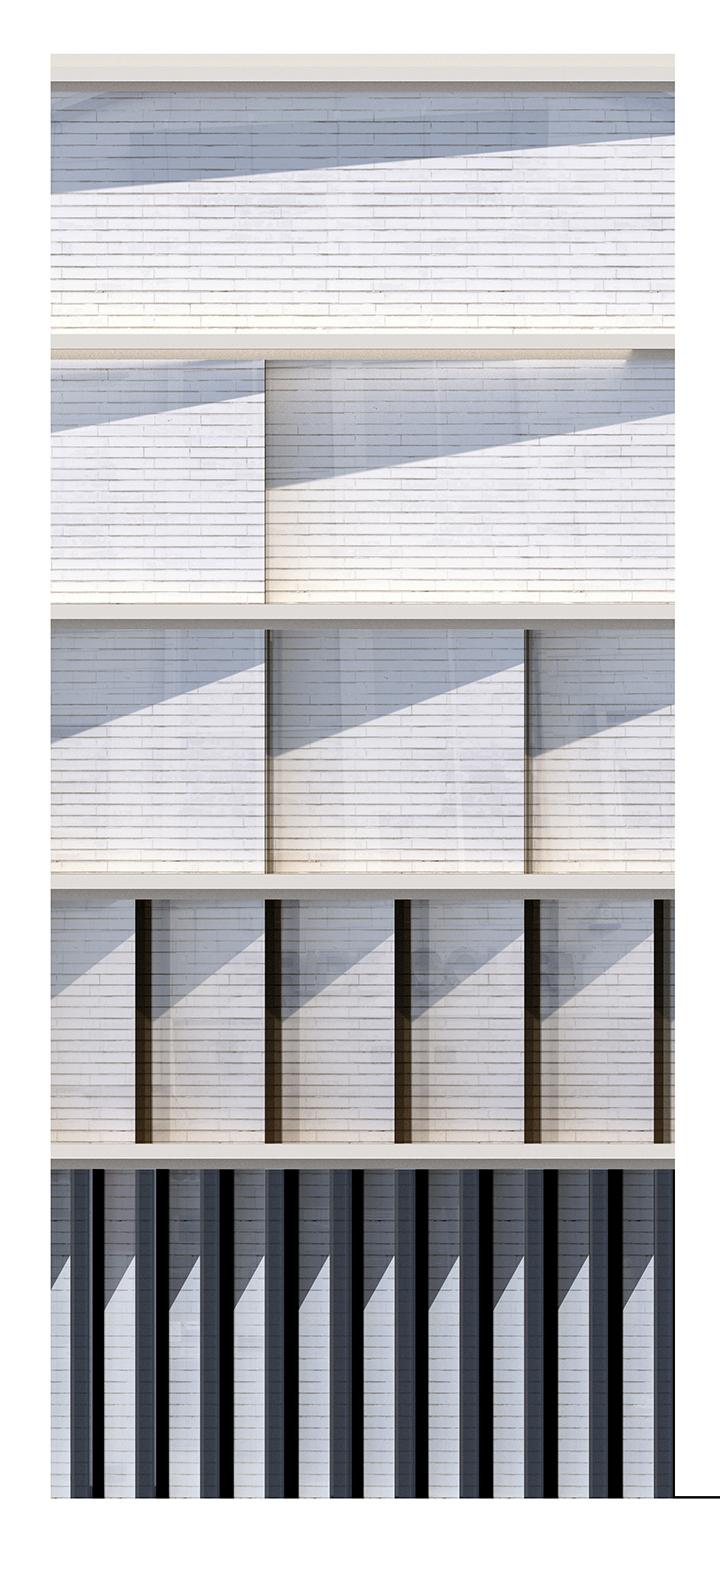 Side facade test